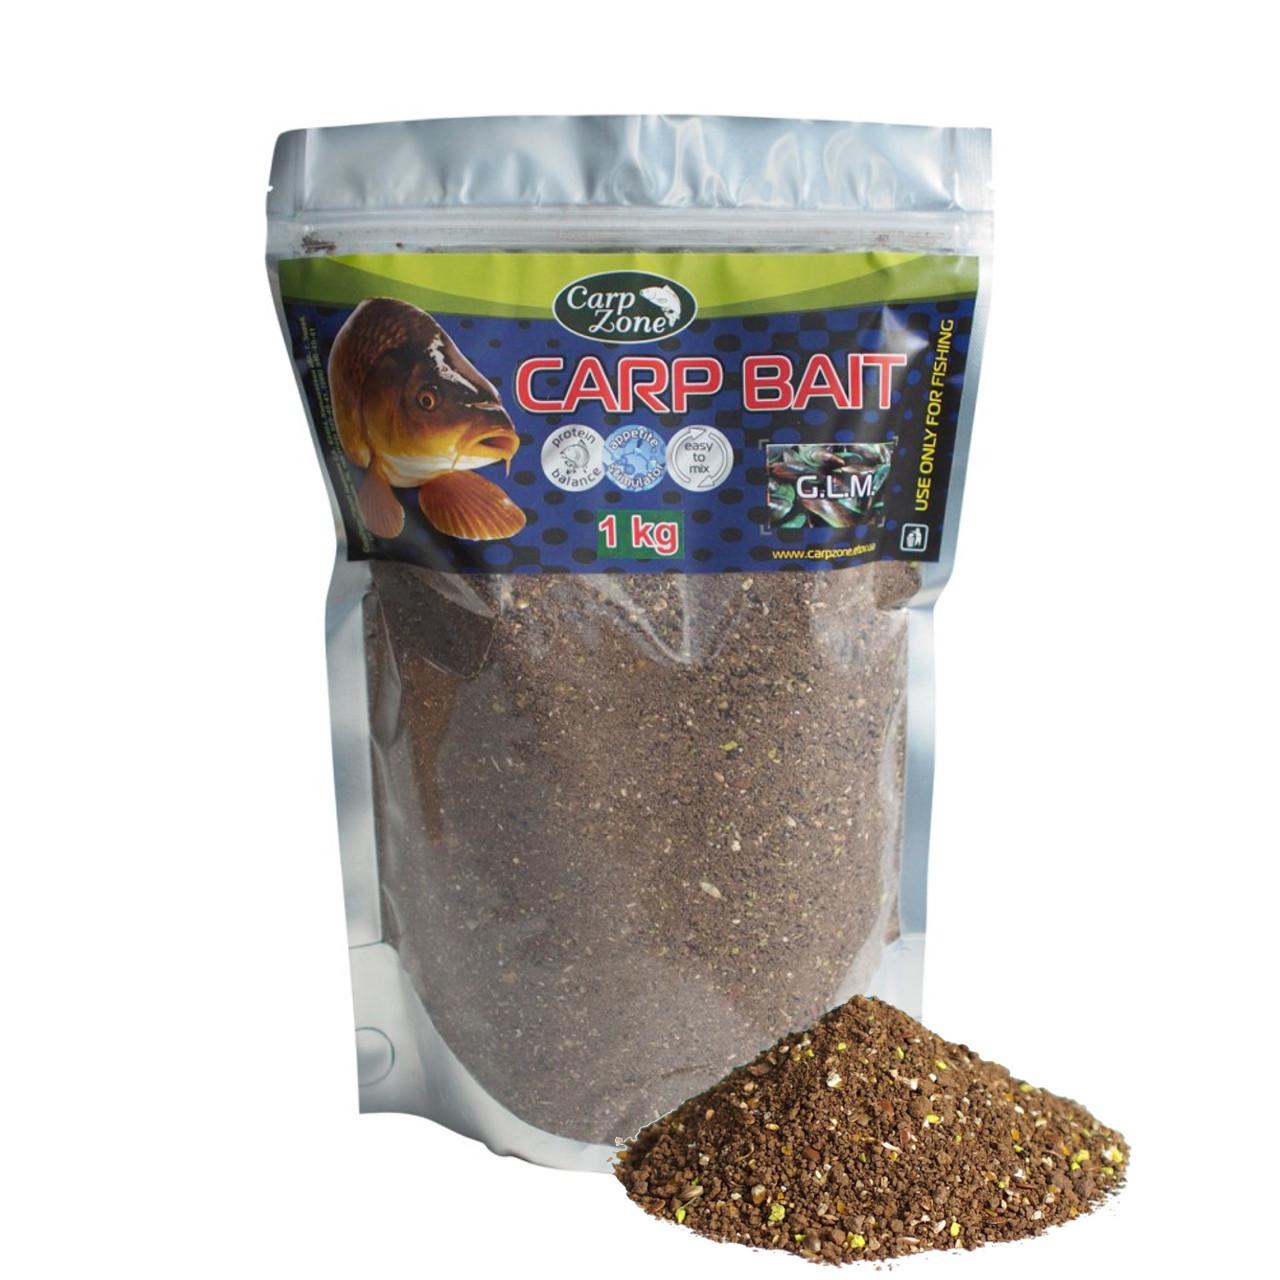 Прикормка Carp Bait G.L.M. (Зеленогубая мидия) 1 кг